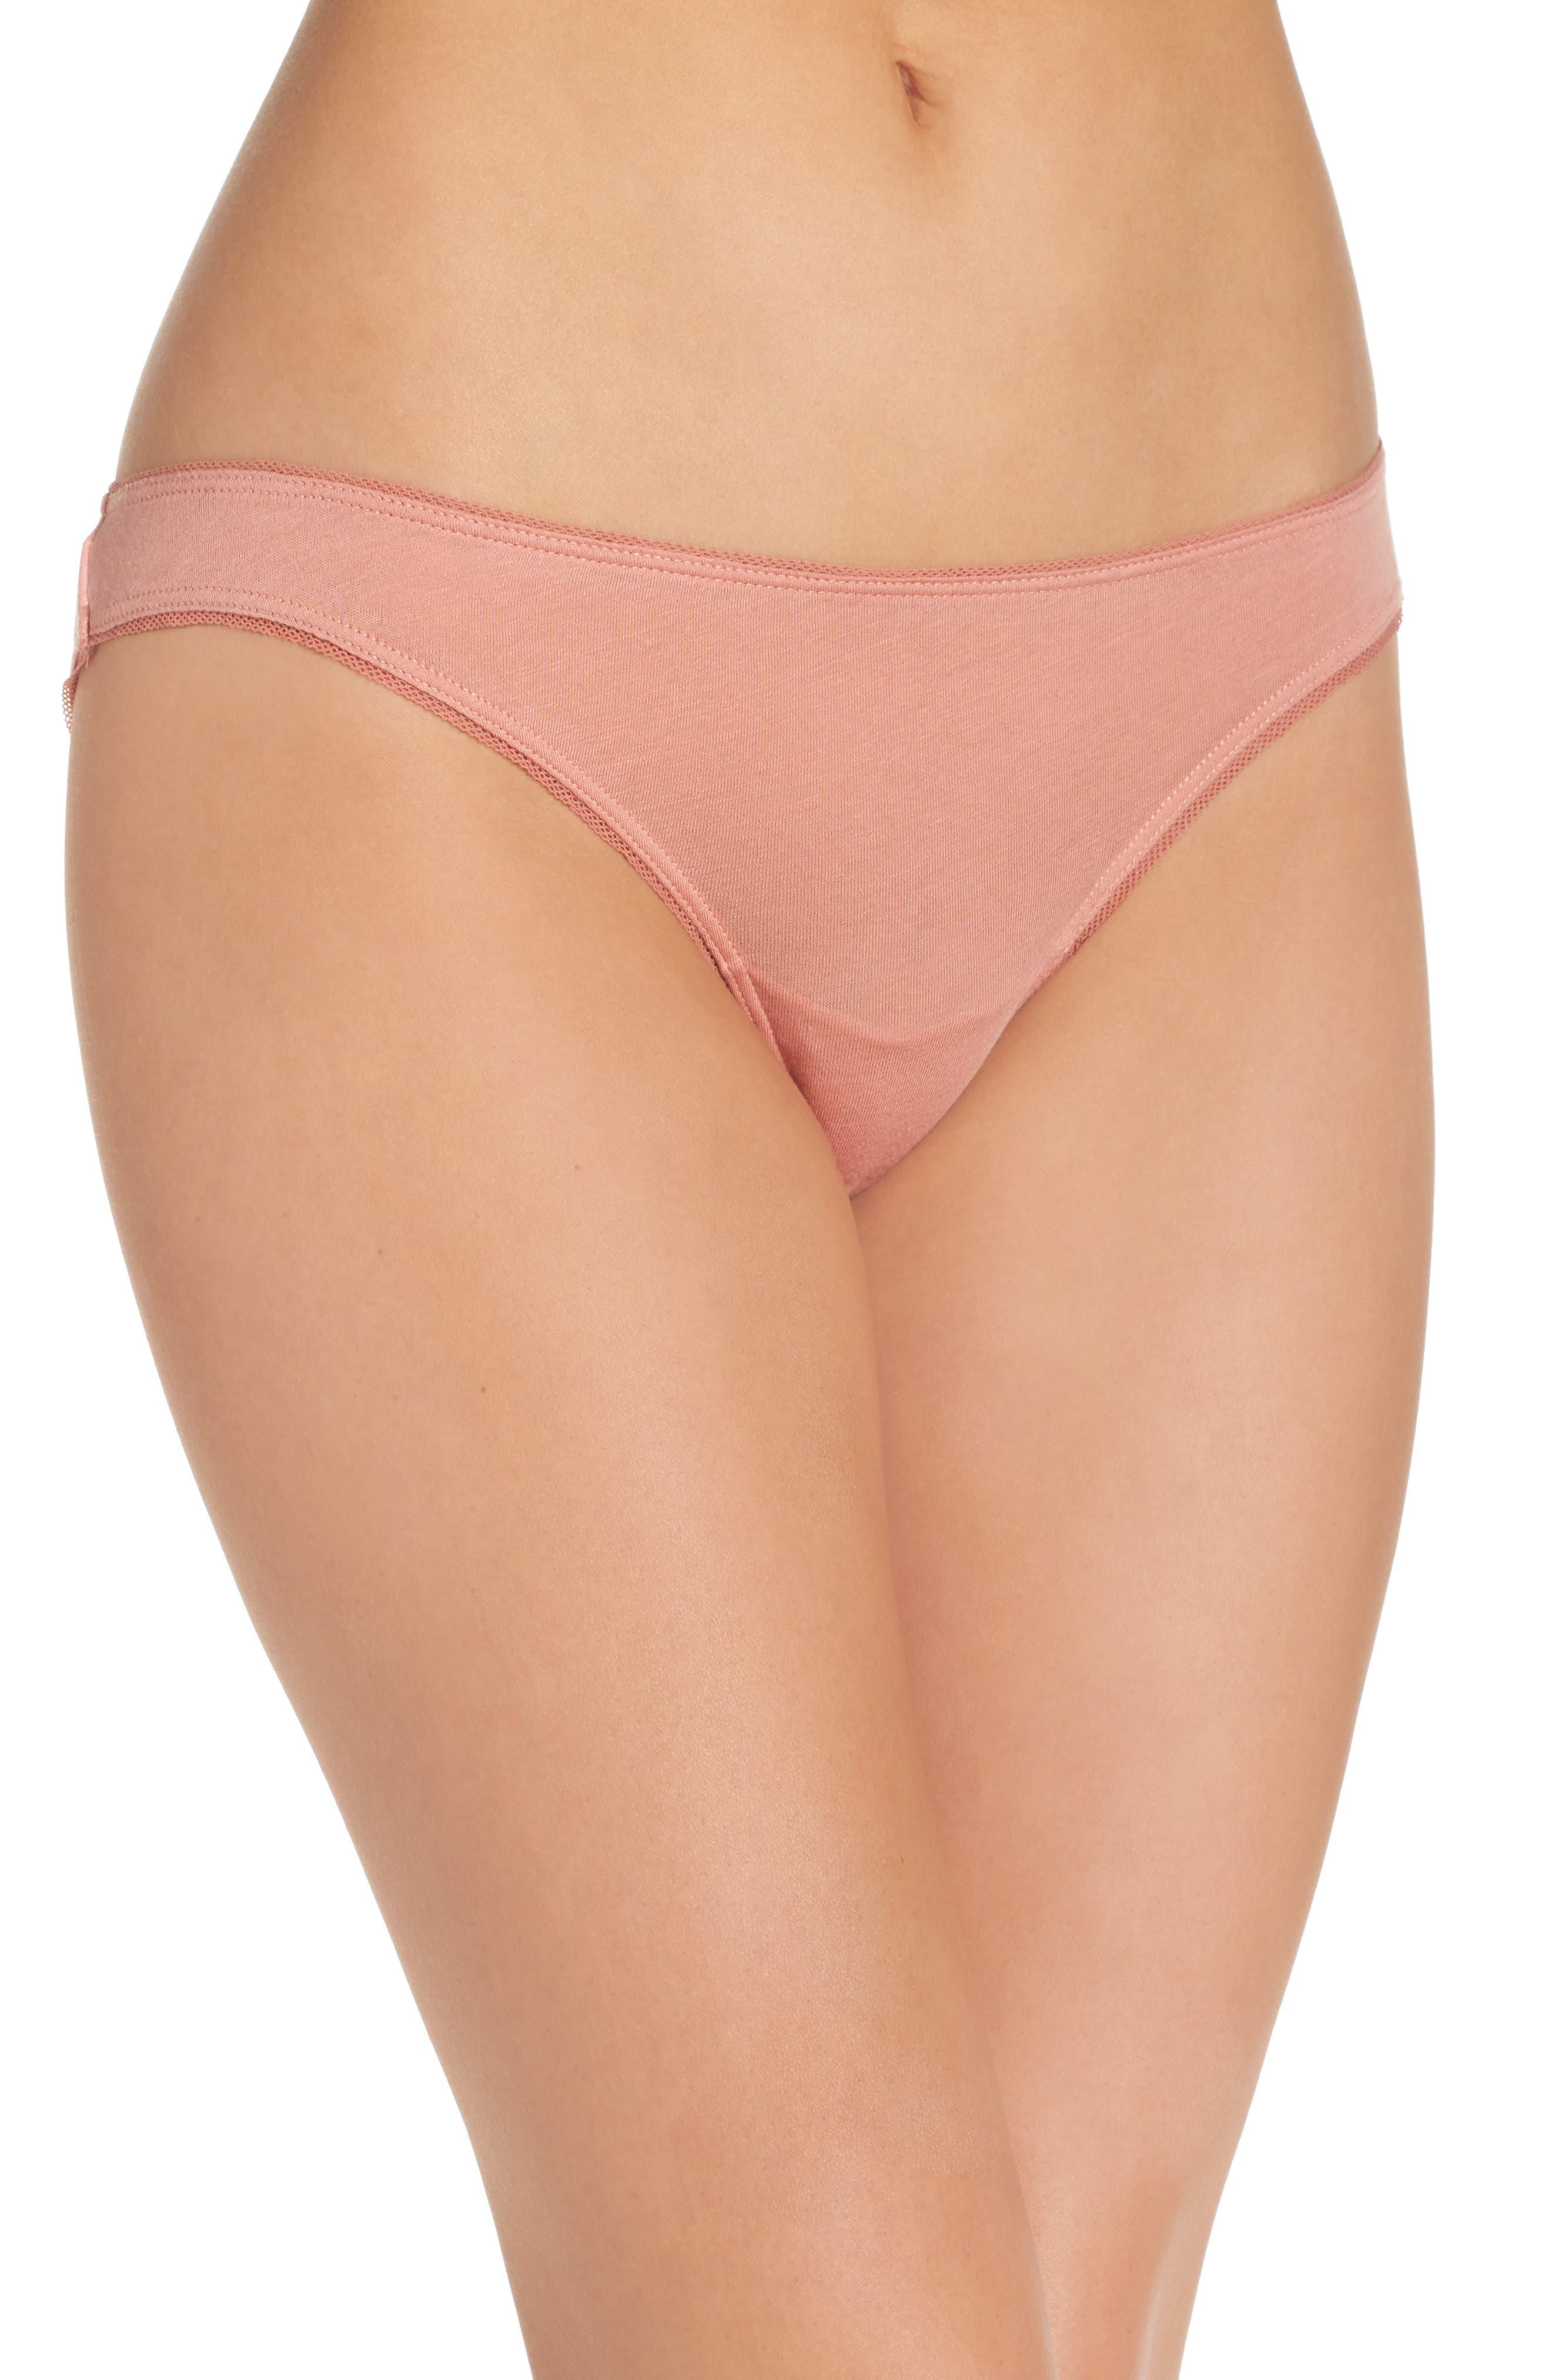 Organic Cotton Bikini,                         Main,                         color, Vintage Pink